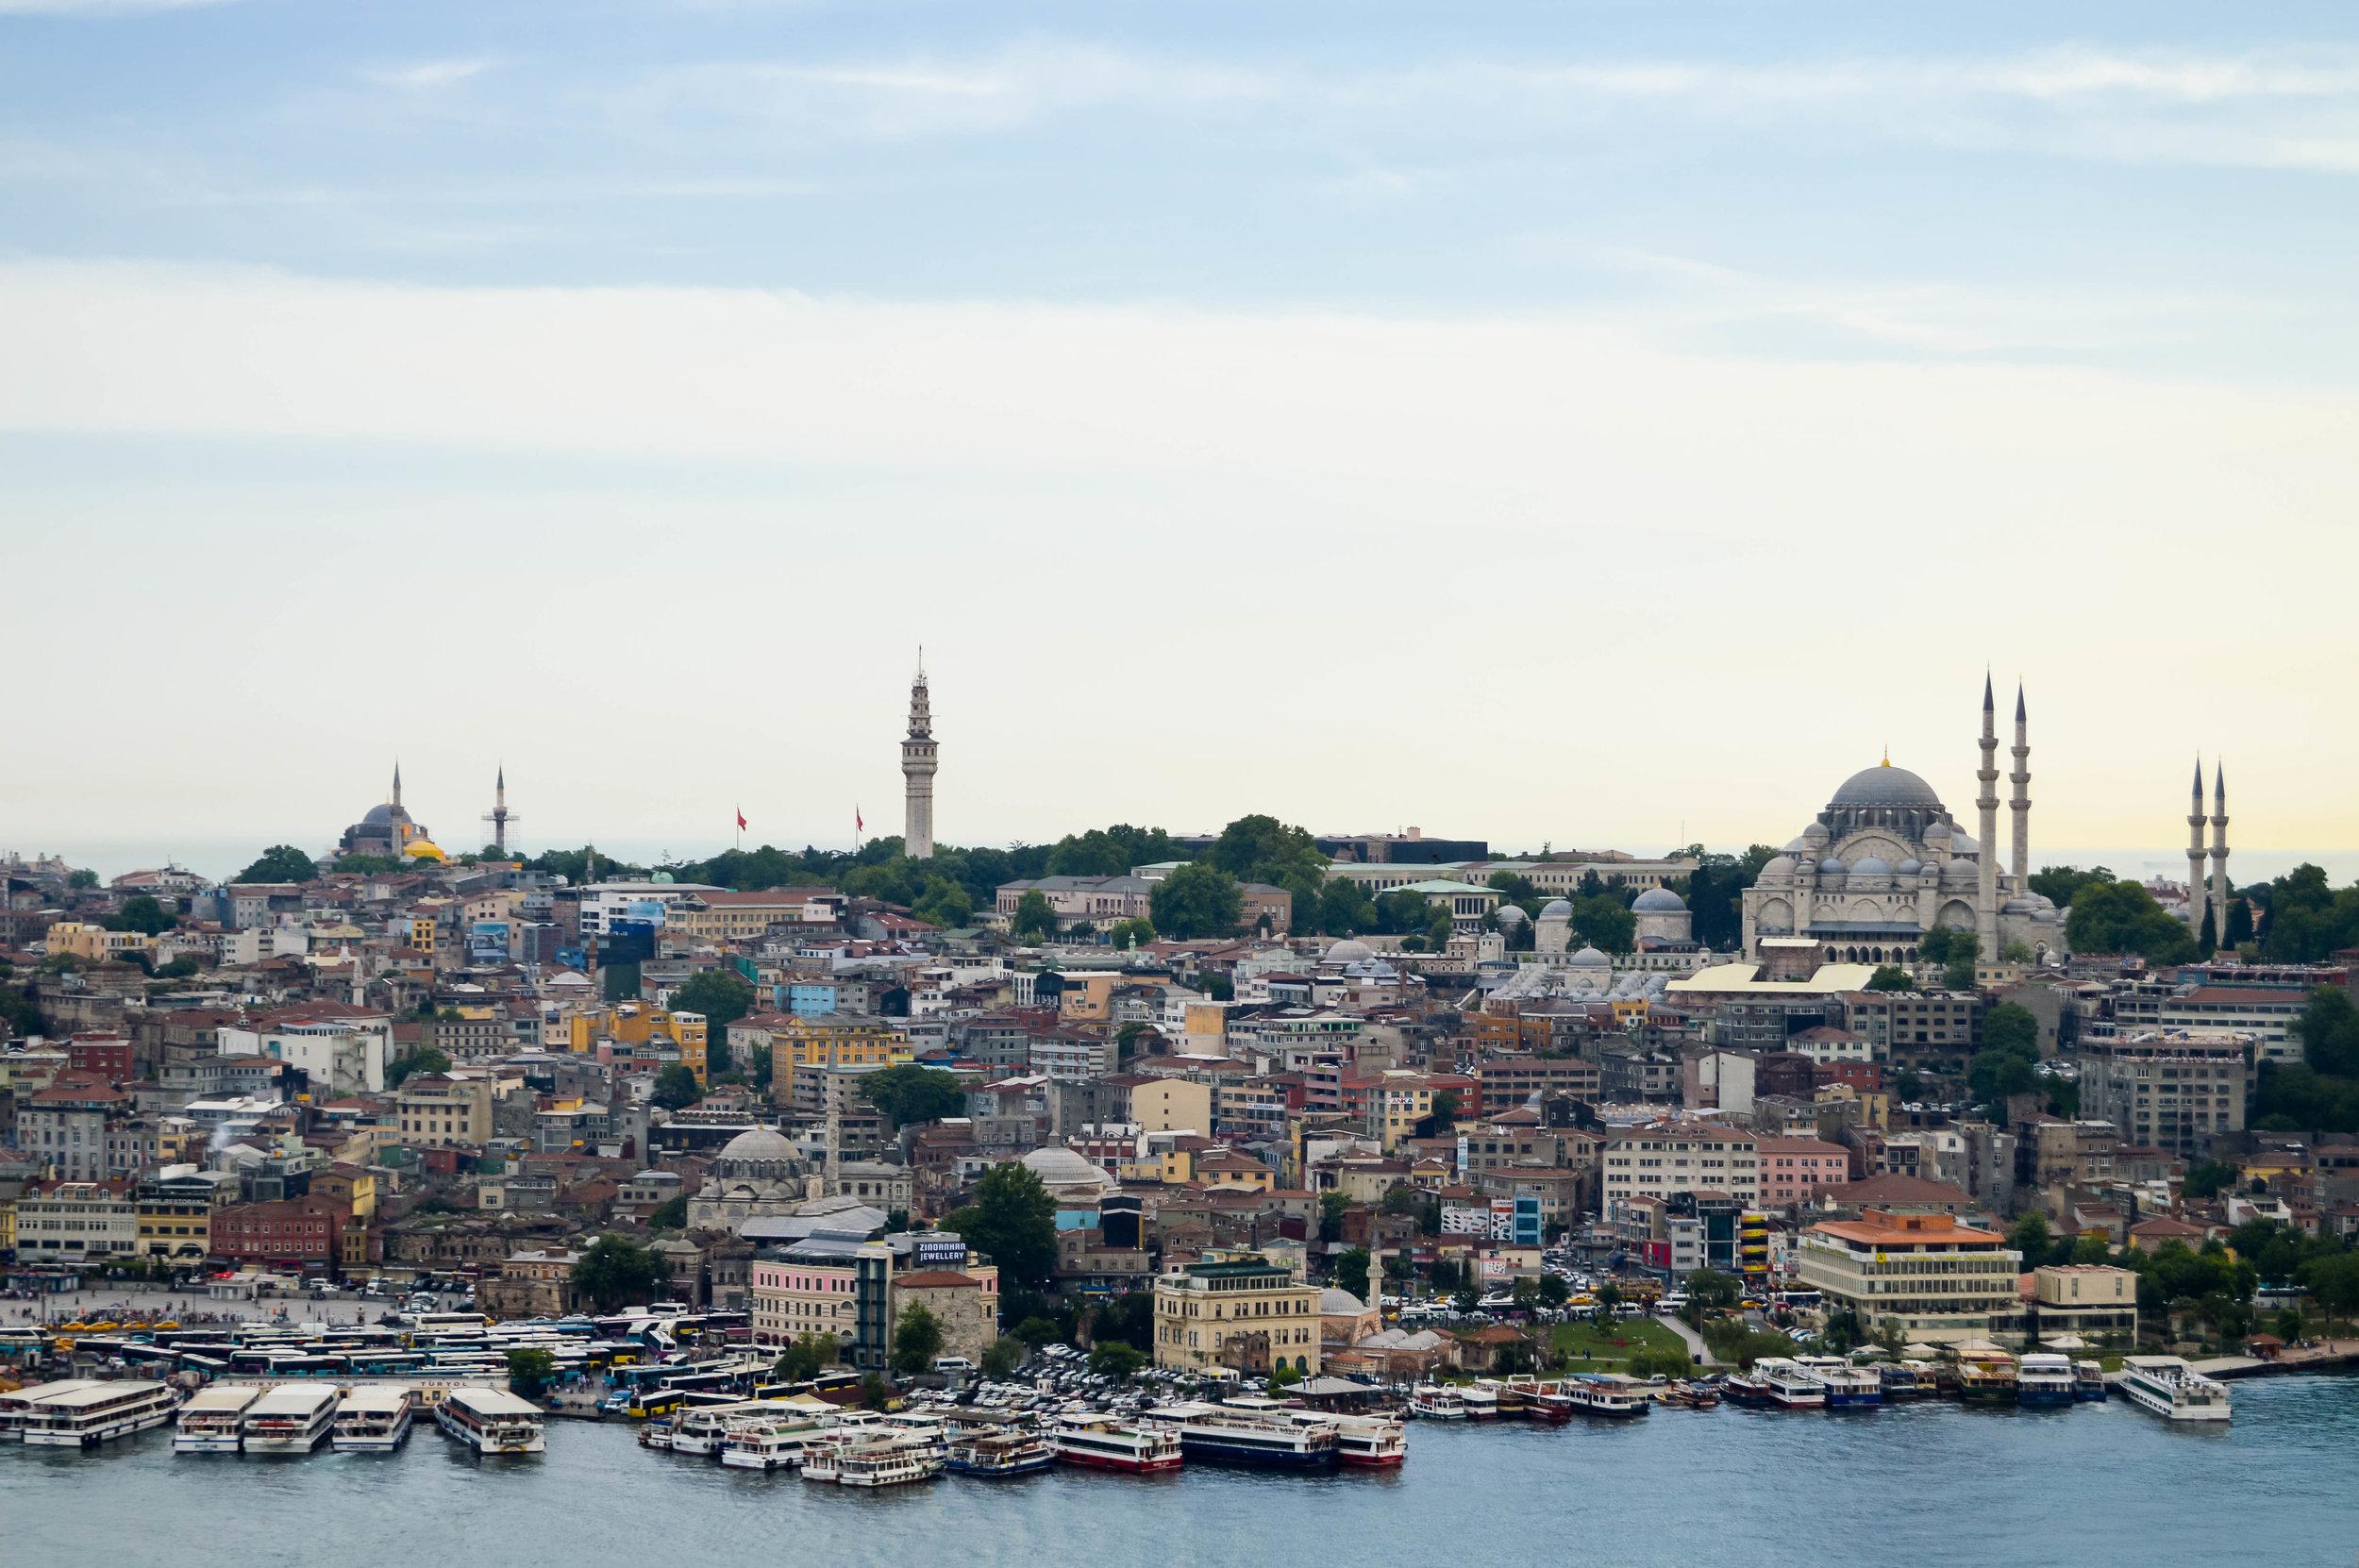 View from Galata Tower Rowhomes Mosques Skyline Bosporus Bosphorus Blue Sky Muslim Ottoman Empire Architecture Istanbul Turkey Blue Mosque Hagia Sophia